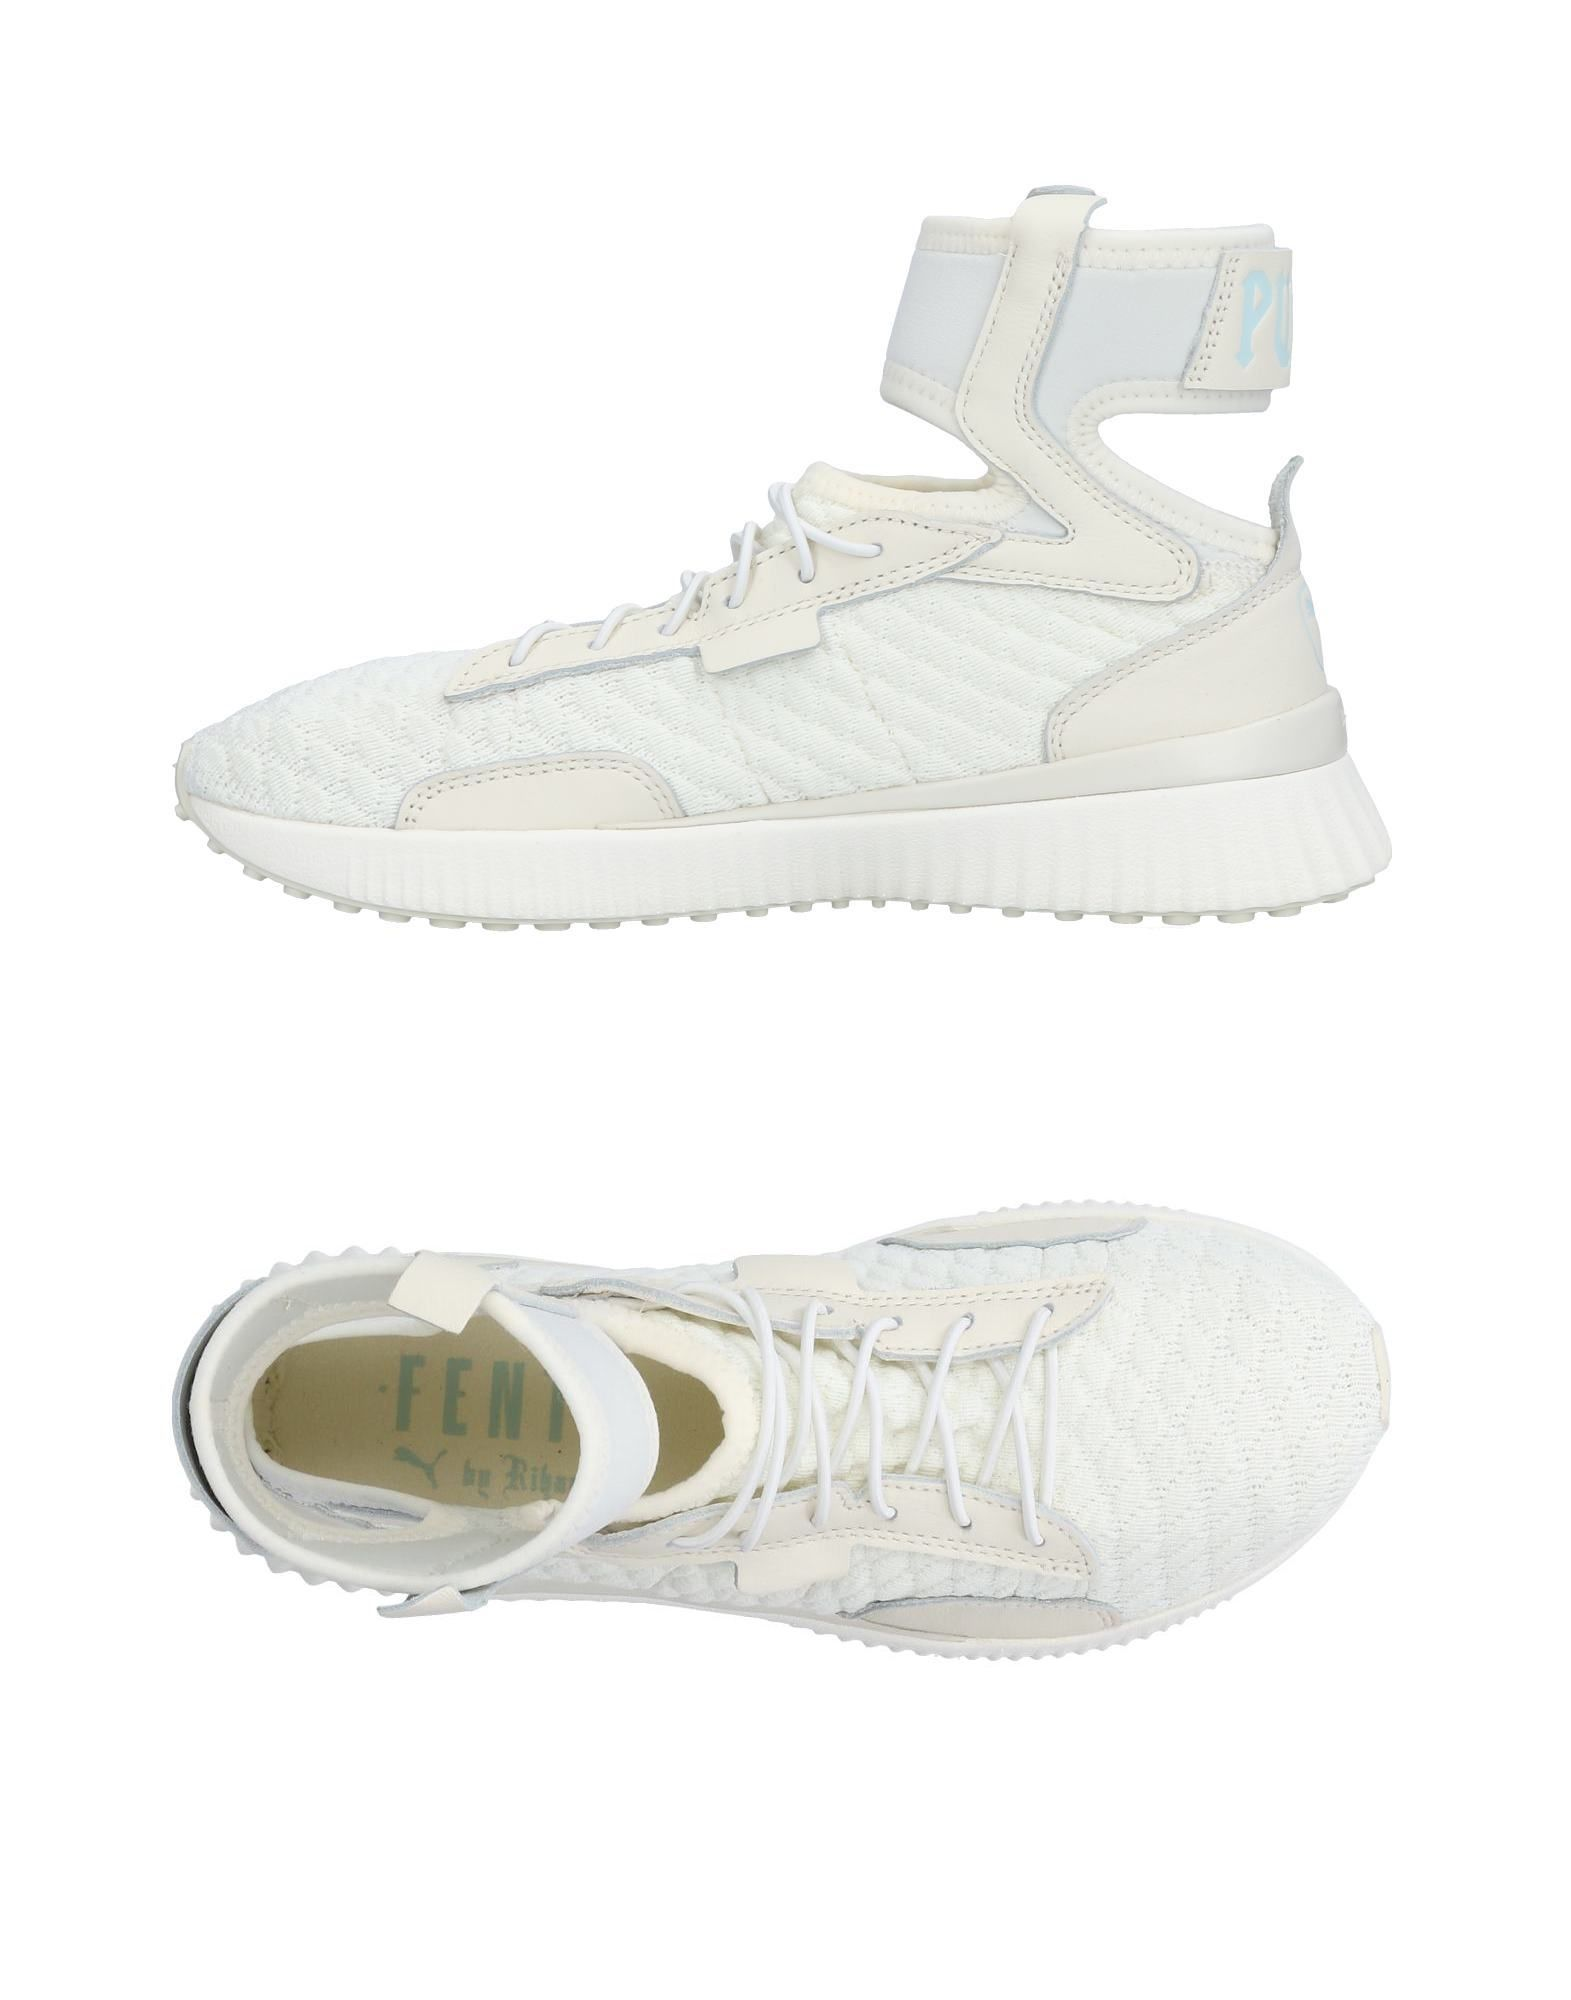 Gut um billige Schuhe Rihanna zu tragenFenty Puma By Rihanna Schuhe Sneakers Damen  11505507FC 2db859